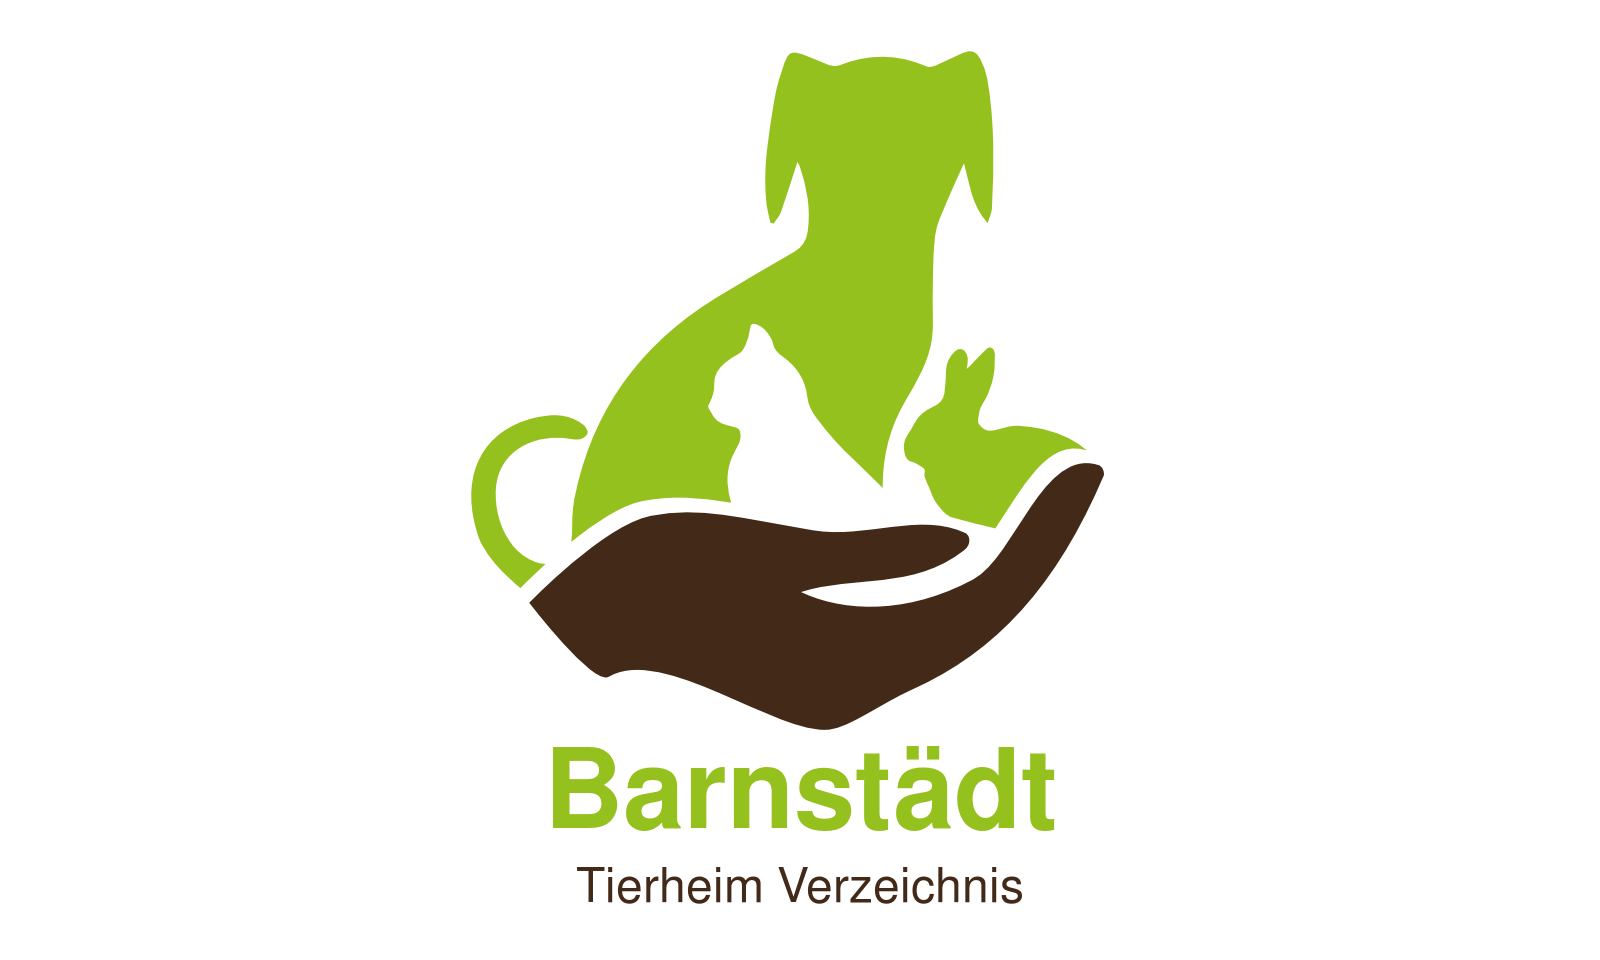 Tierheim Barnstädt